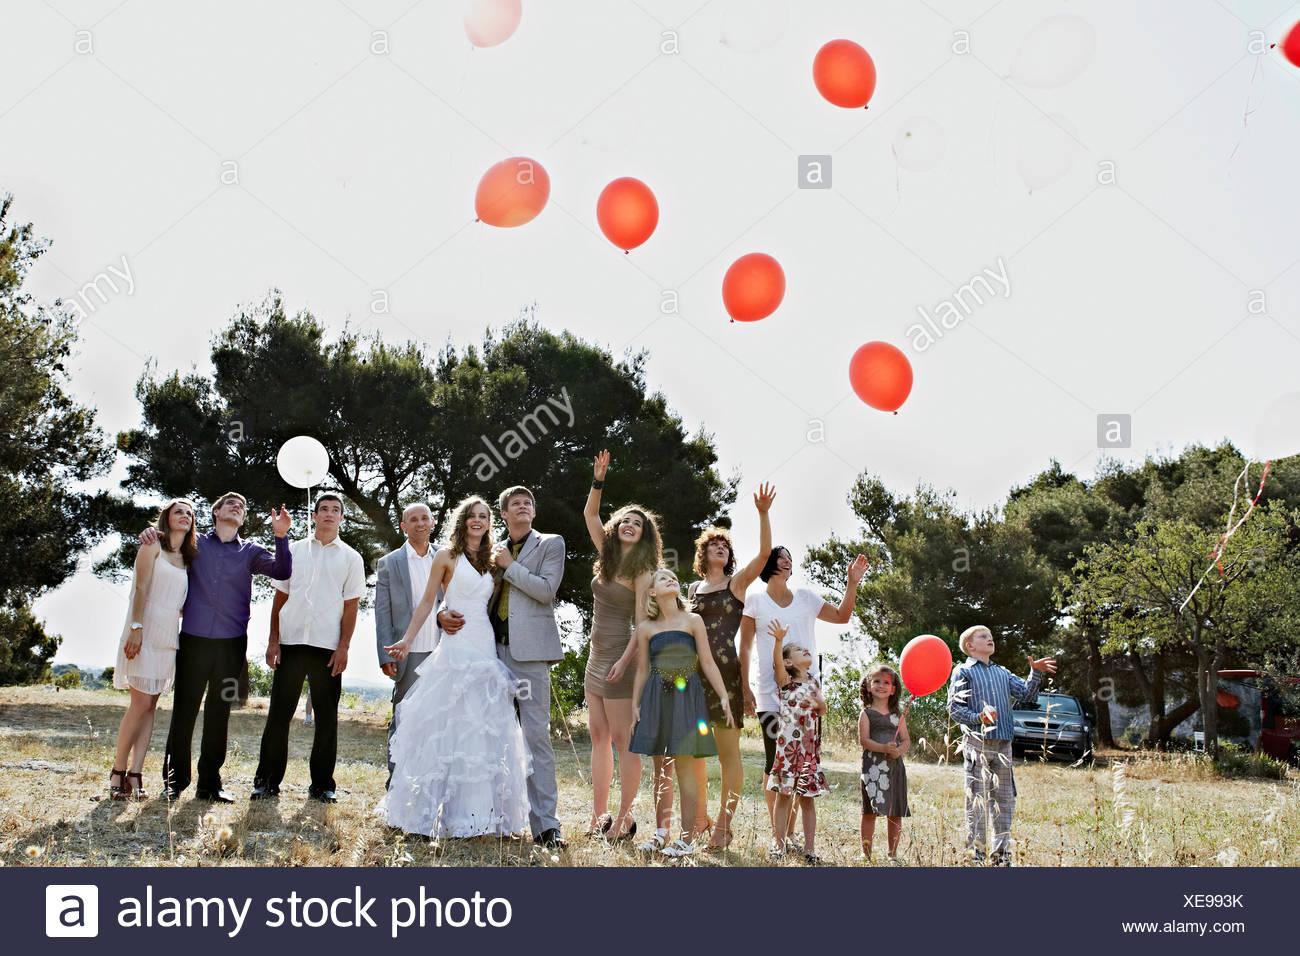 Wedding Guests With Balloons, Croatia, Dalmatia - Stock Image